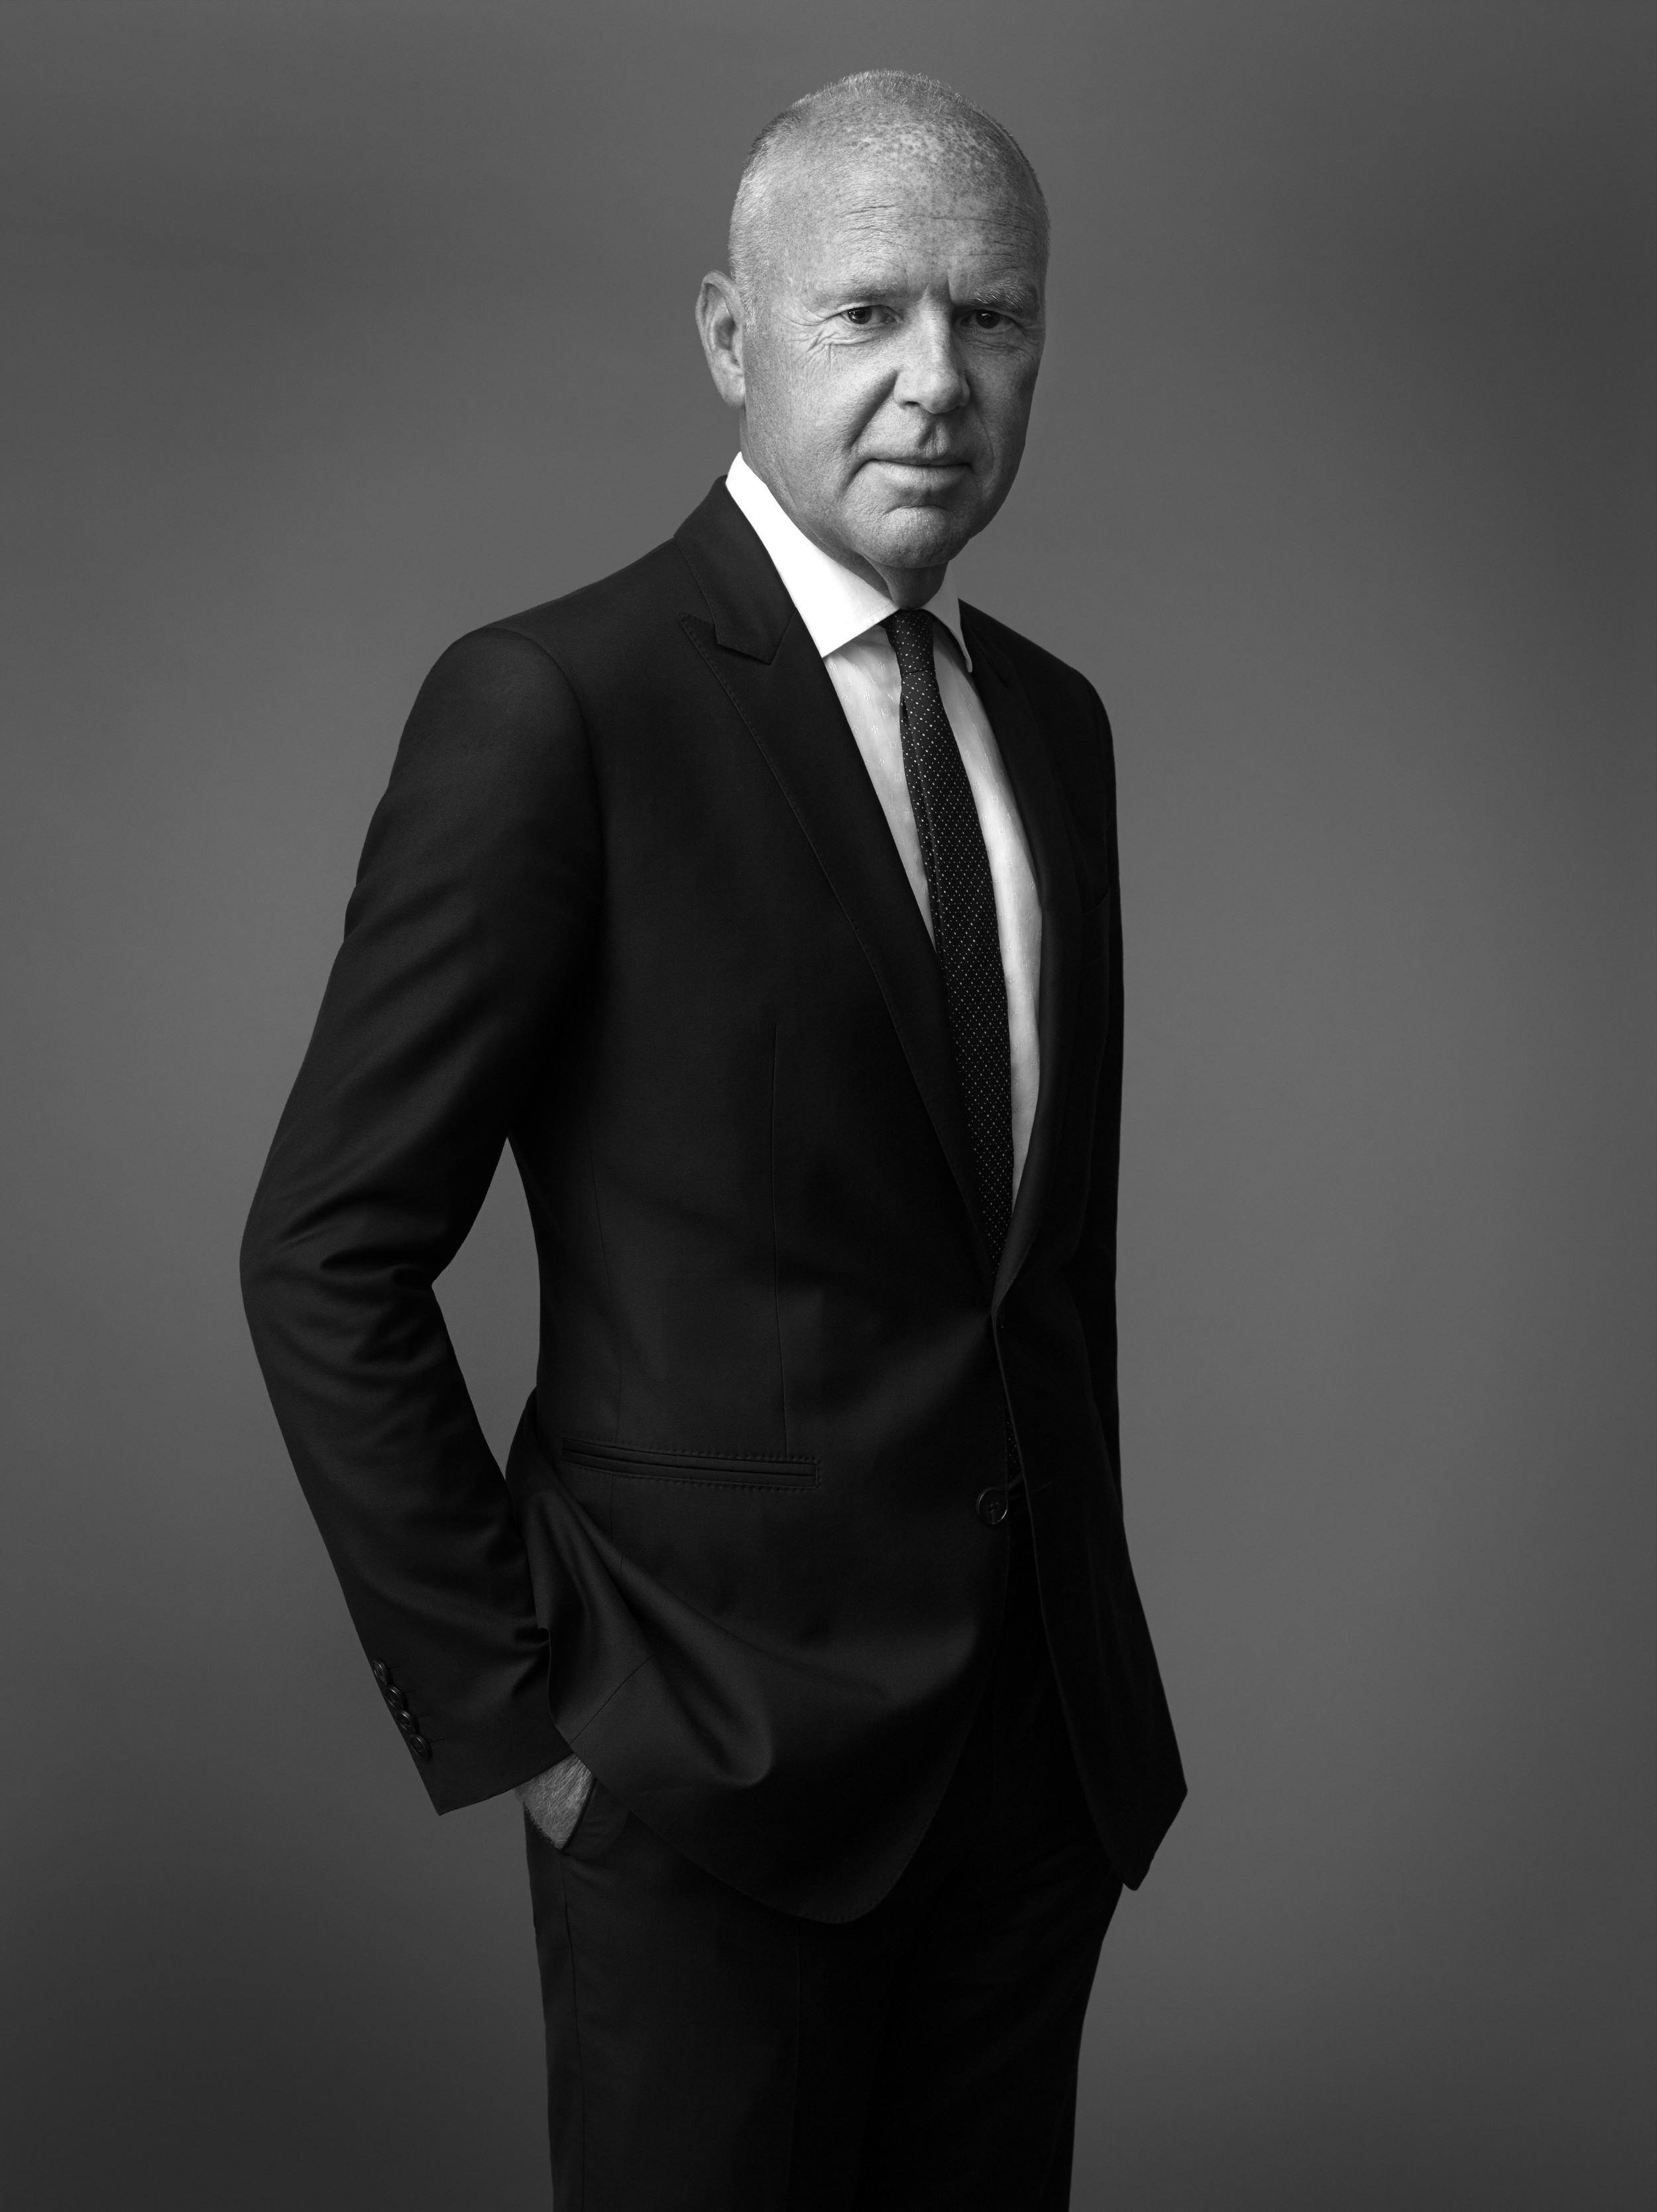 Garry Hogarth, Agent Provocateur CEO